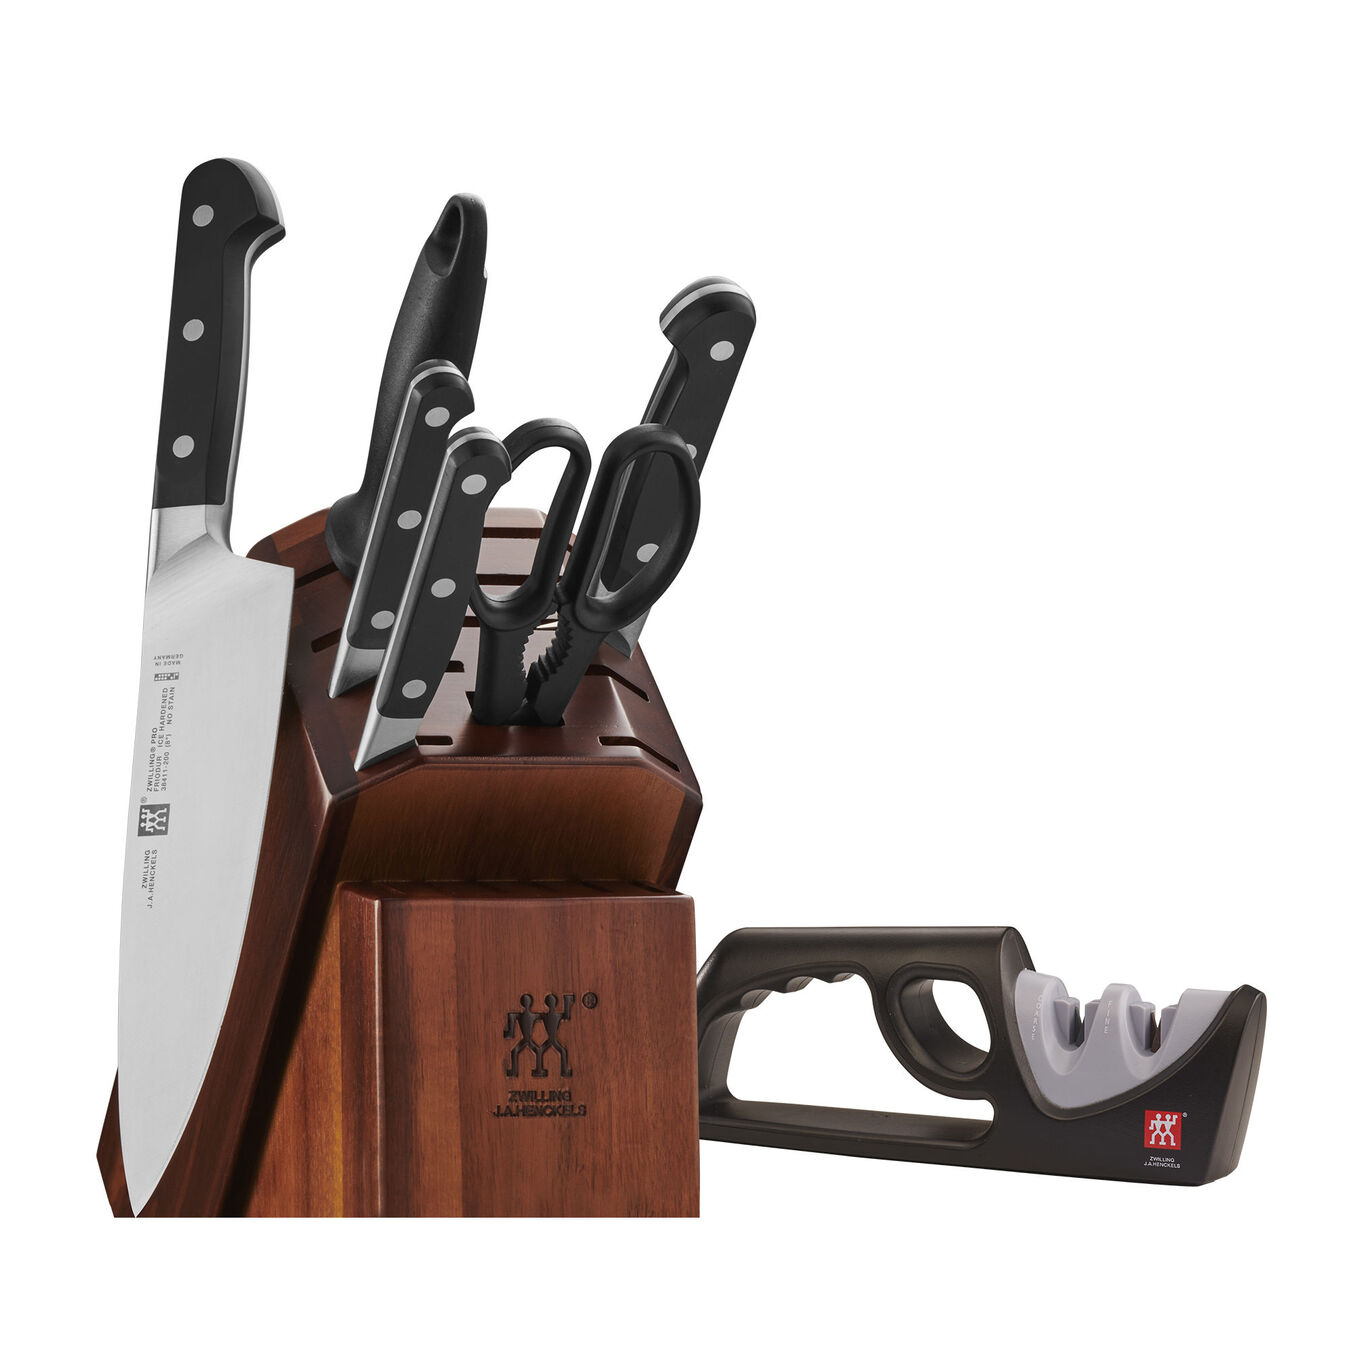 7-pc Knife Block Set with Bonus Sharpener,,large 1